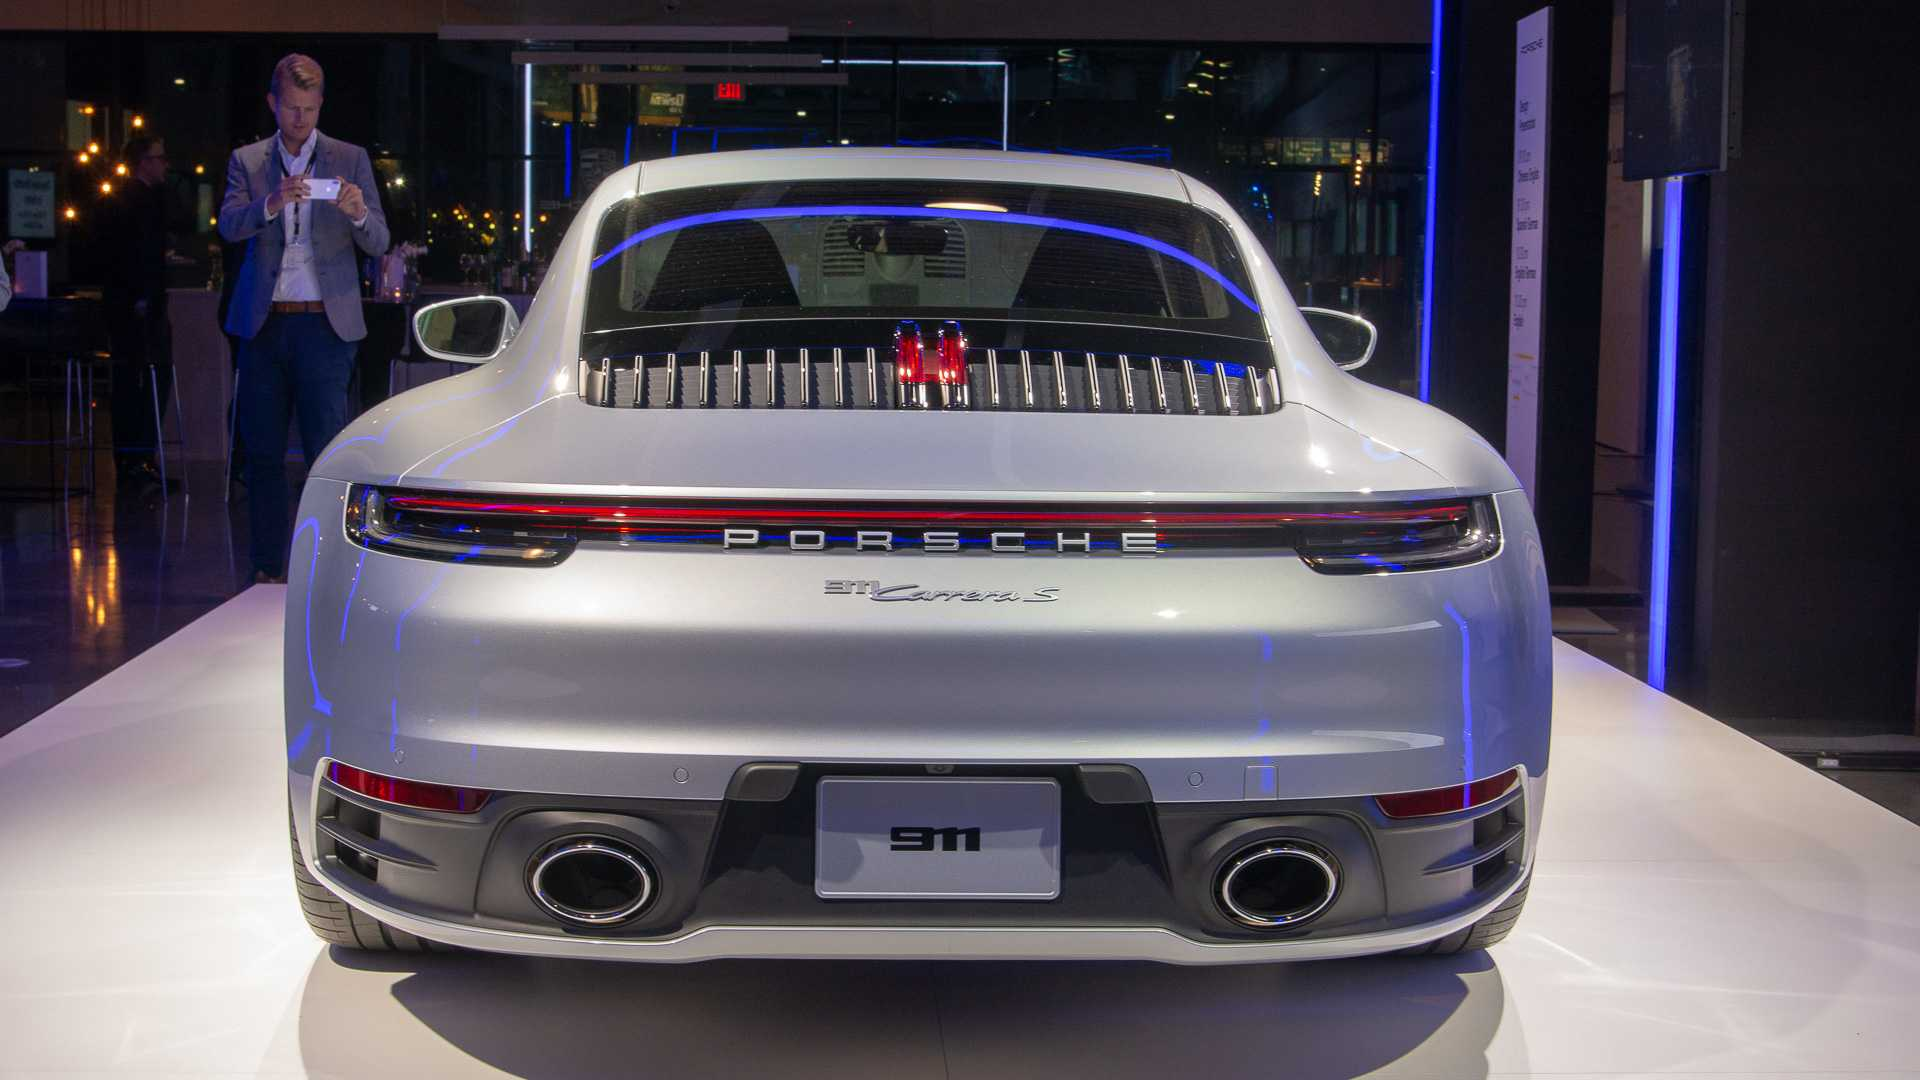 2020-porsche-911-carrera-s-4.jpg